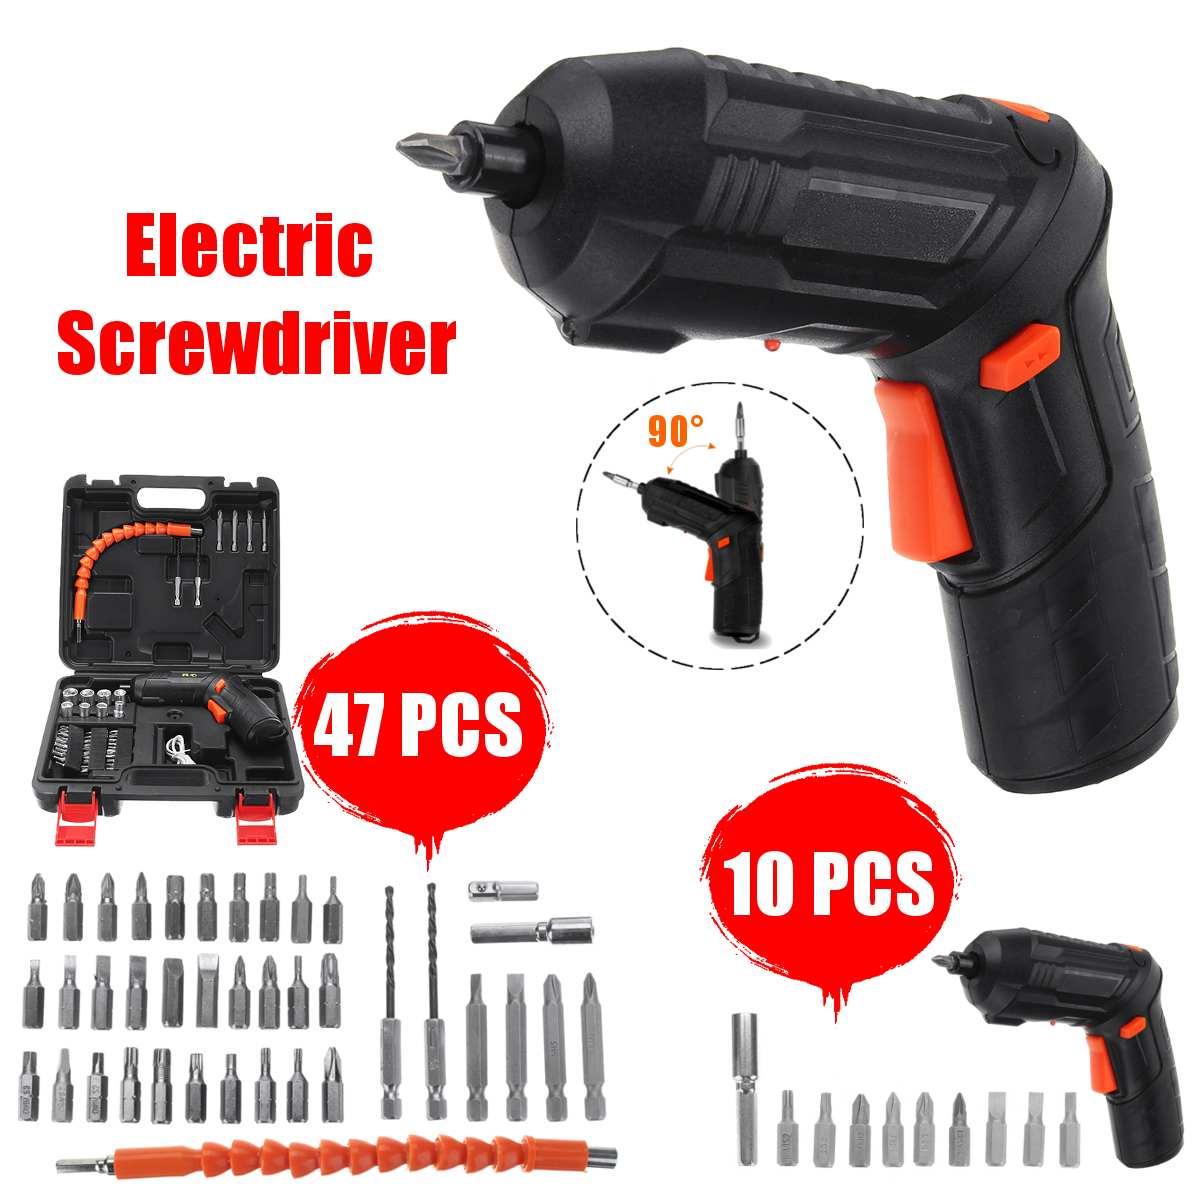 47pcs/10pcs 3.6V Mini Electric Screwdriver Tools set Light LED Cordless Drill USB Rechargeable Home Tools